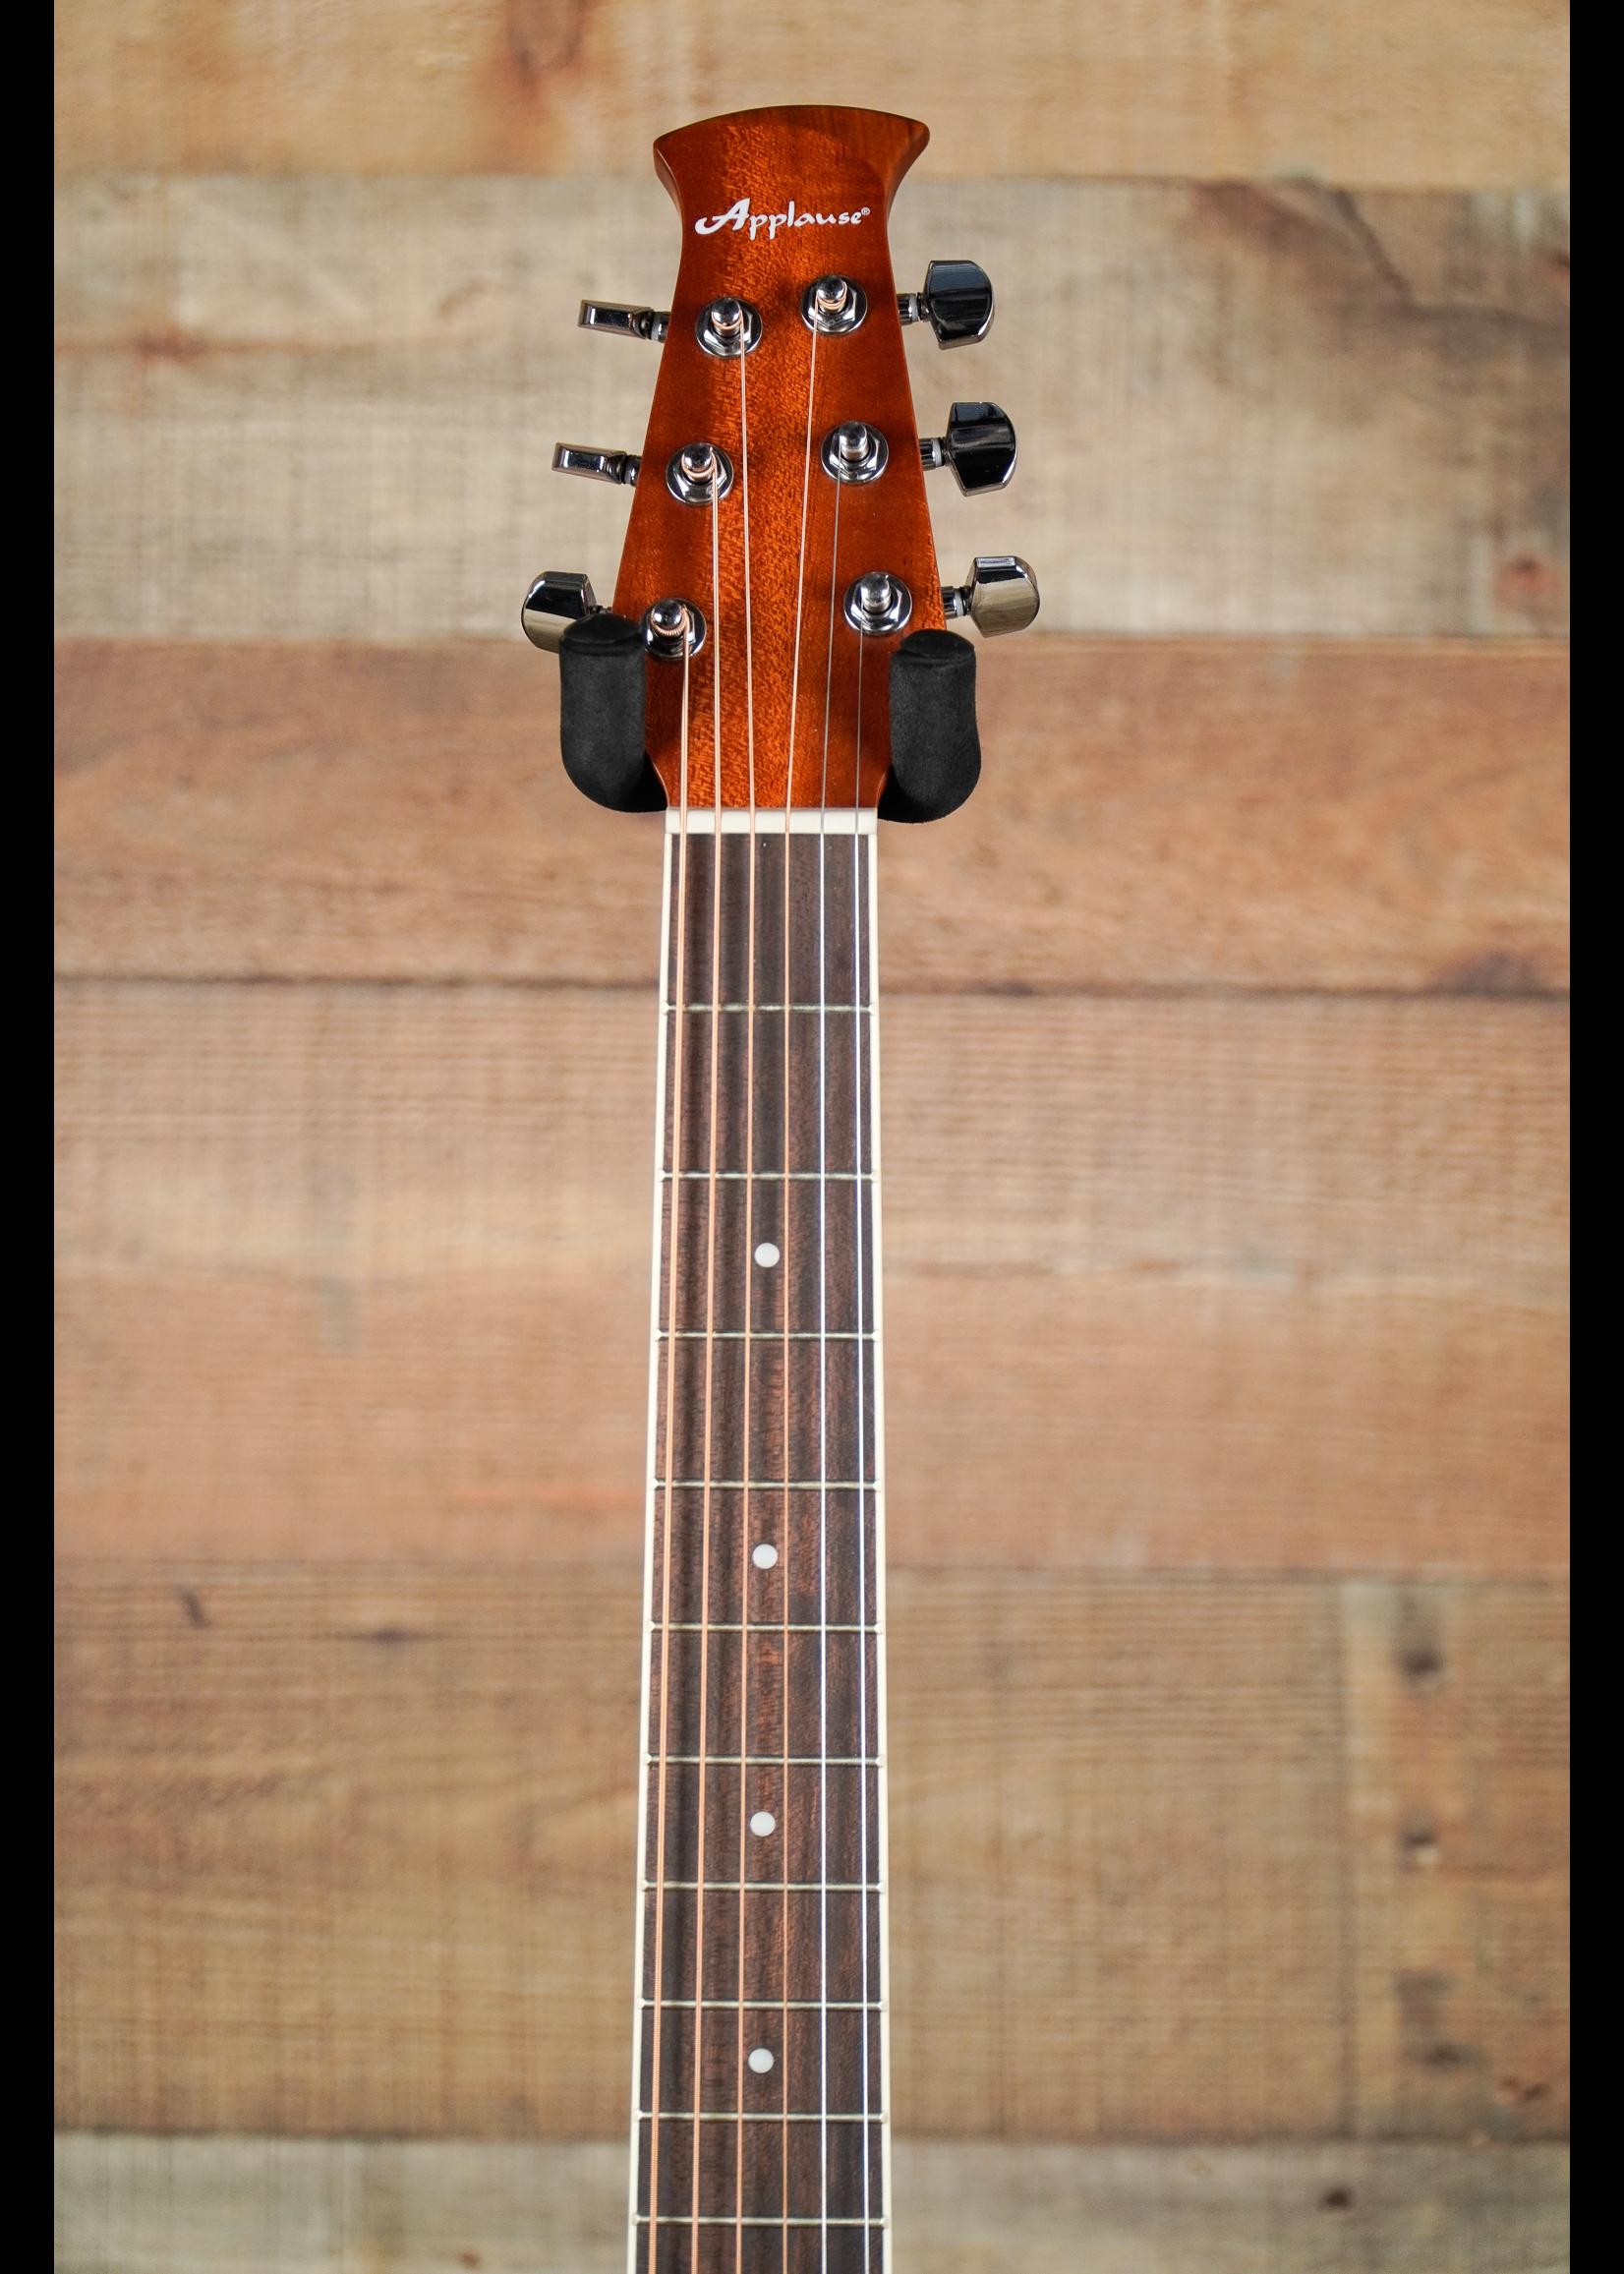 Applause Applause E-Acoustic Guitar AB24-5S, CS,  Cutaway, Black Satin Mid-Depth